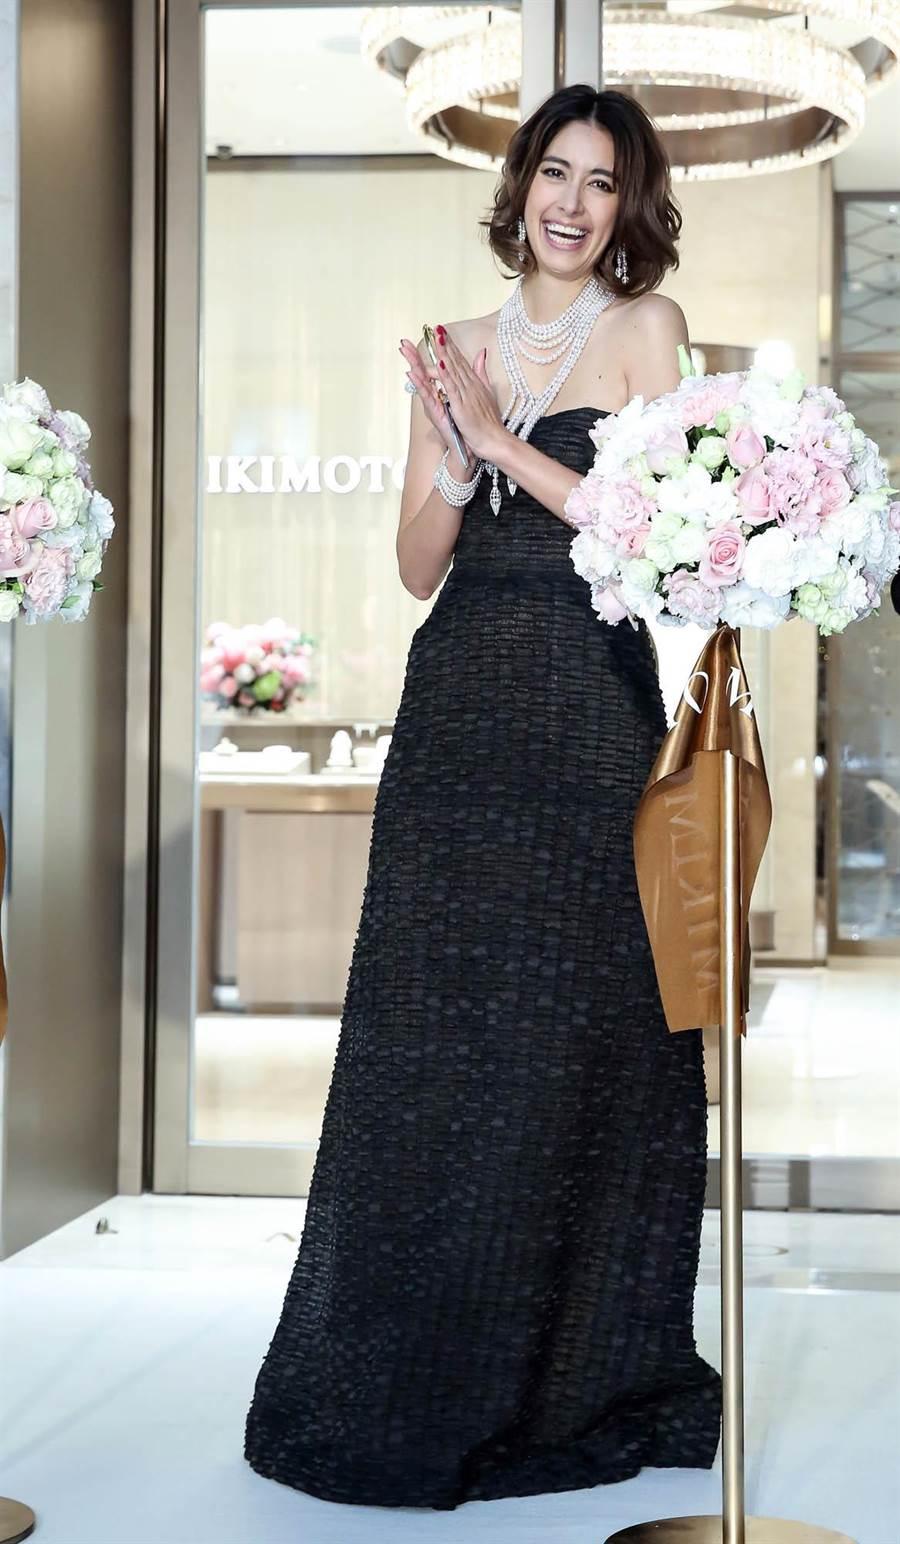 MIKIMOTO台北101頂級珠寶旗艦店開幕剪綵儀式記者會,圖為日本名媛名模 森泉Mori Izumi擔任嘉賓。(陳俊吉攝)